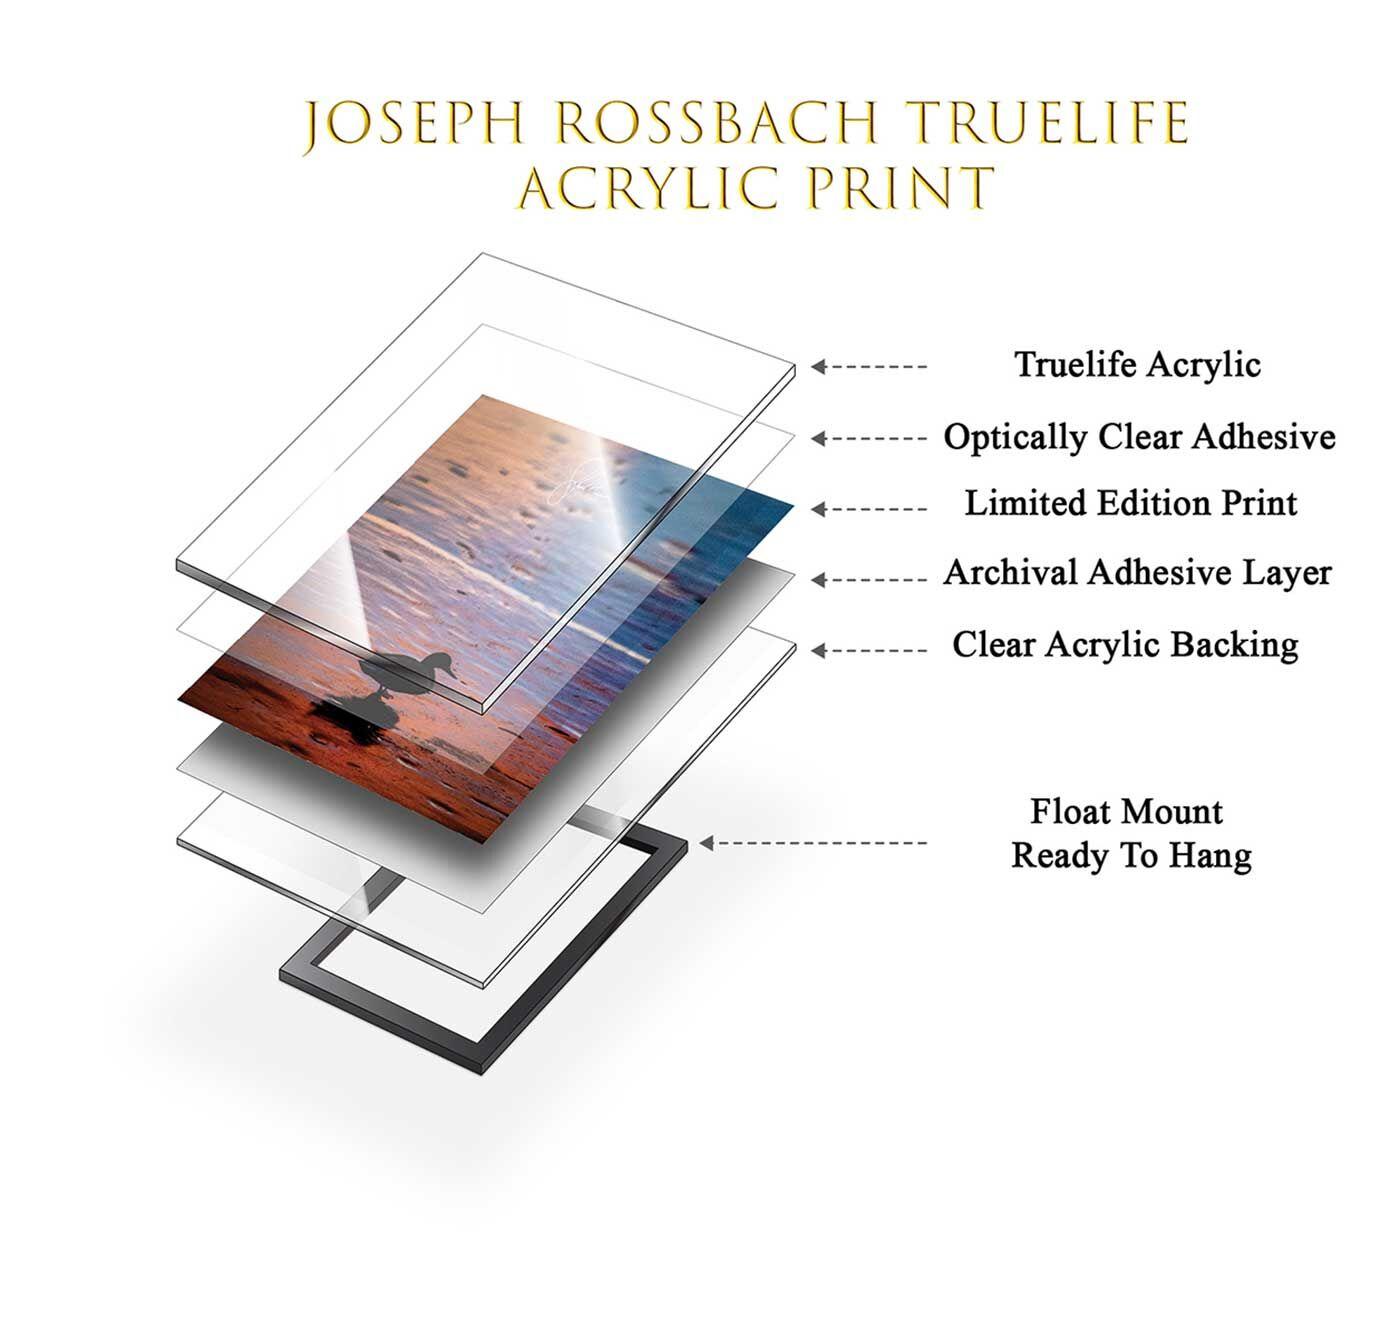 Acrylic Fine Art Print Detail